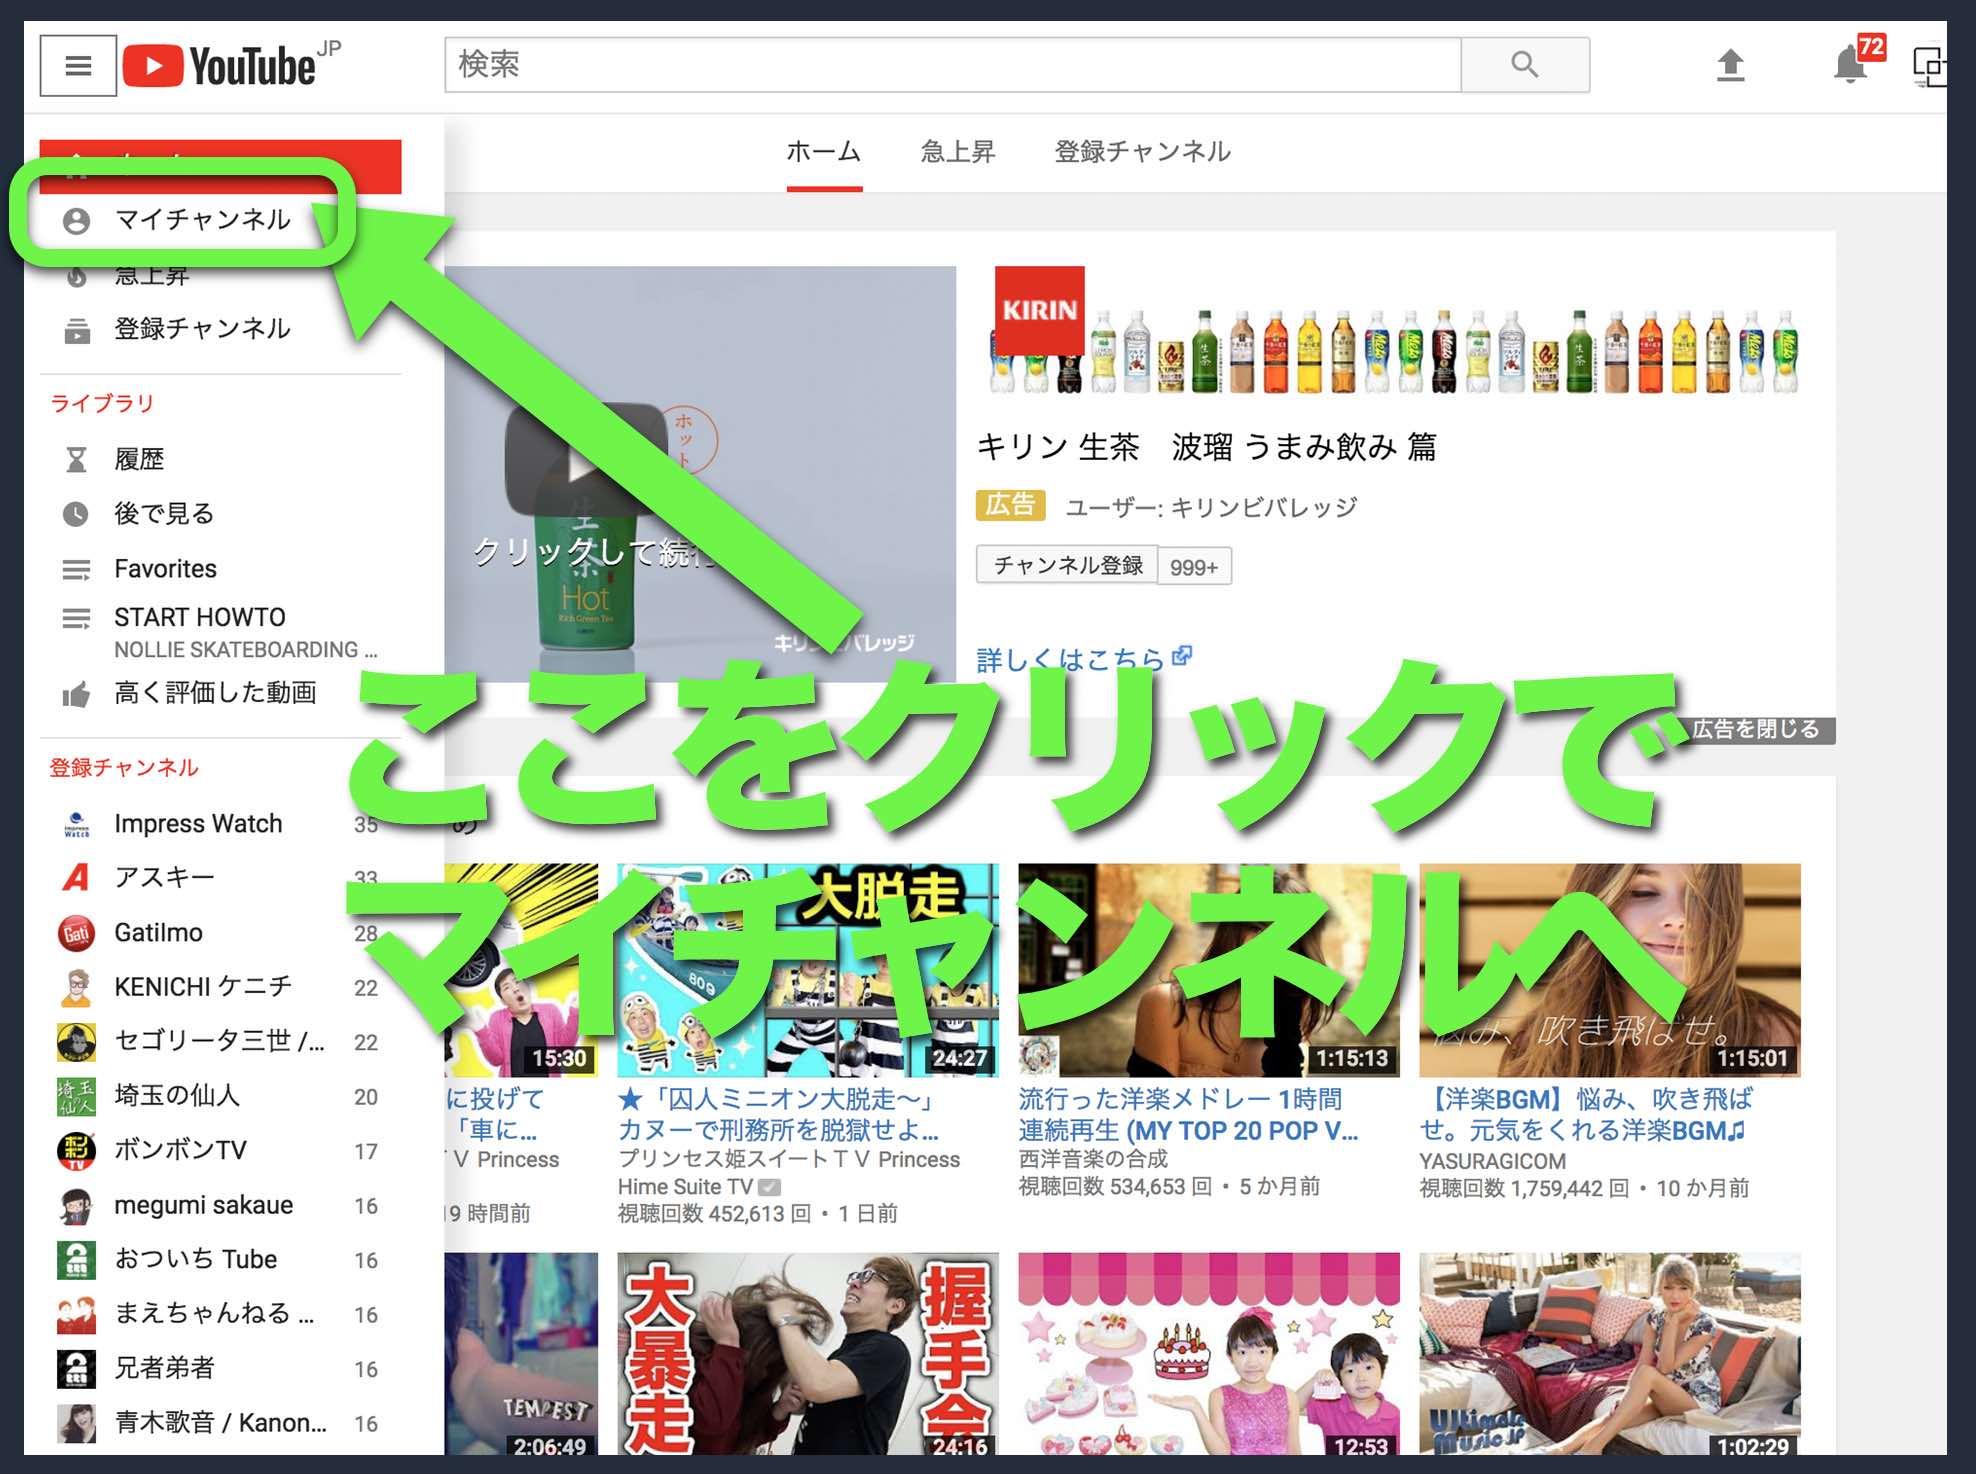 YouTubeチャンネル画面の画像